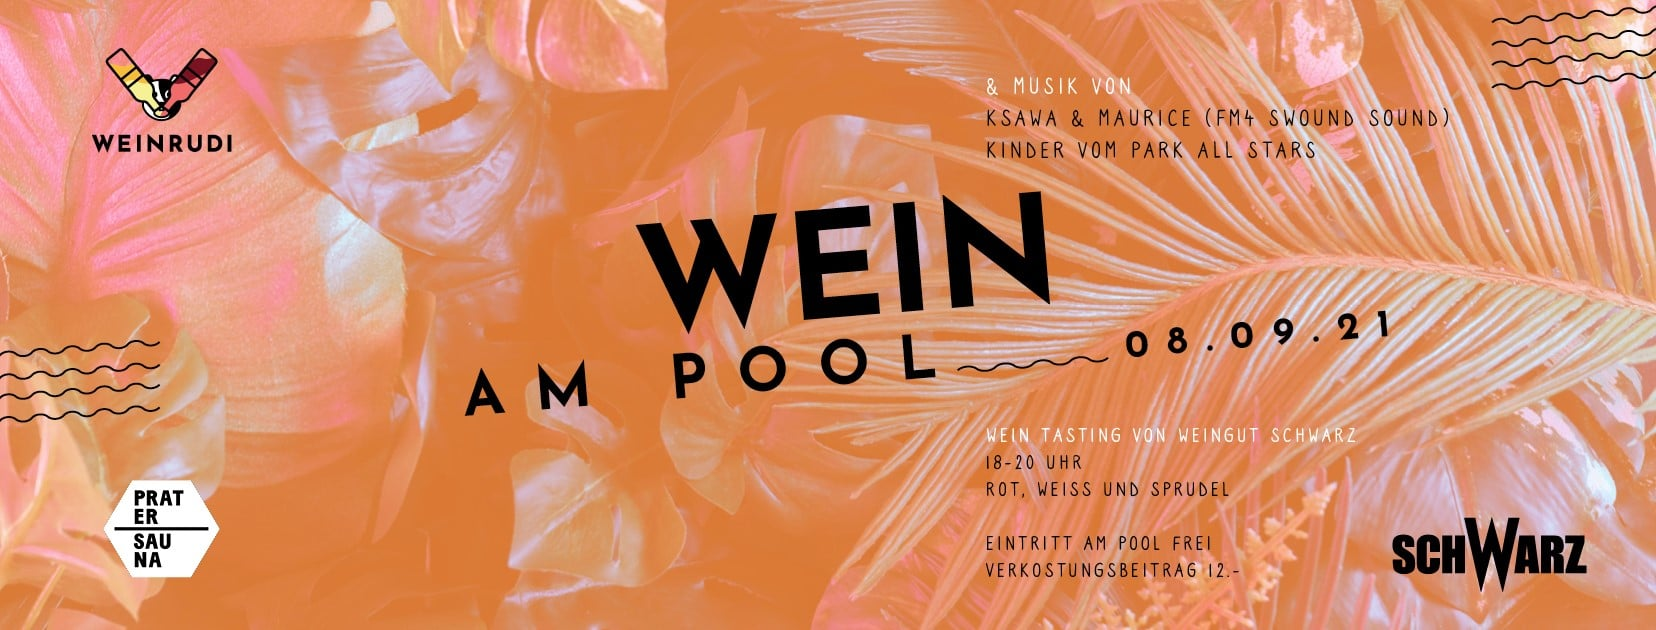 Events Wien: WEIN AM POOL – Summer Closing w Michael Schwarz